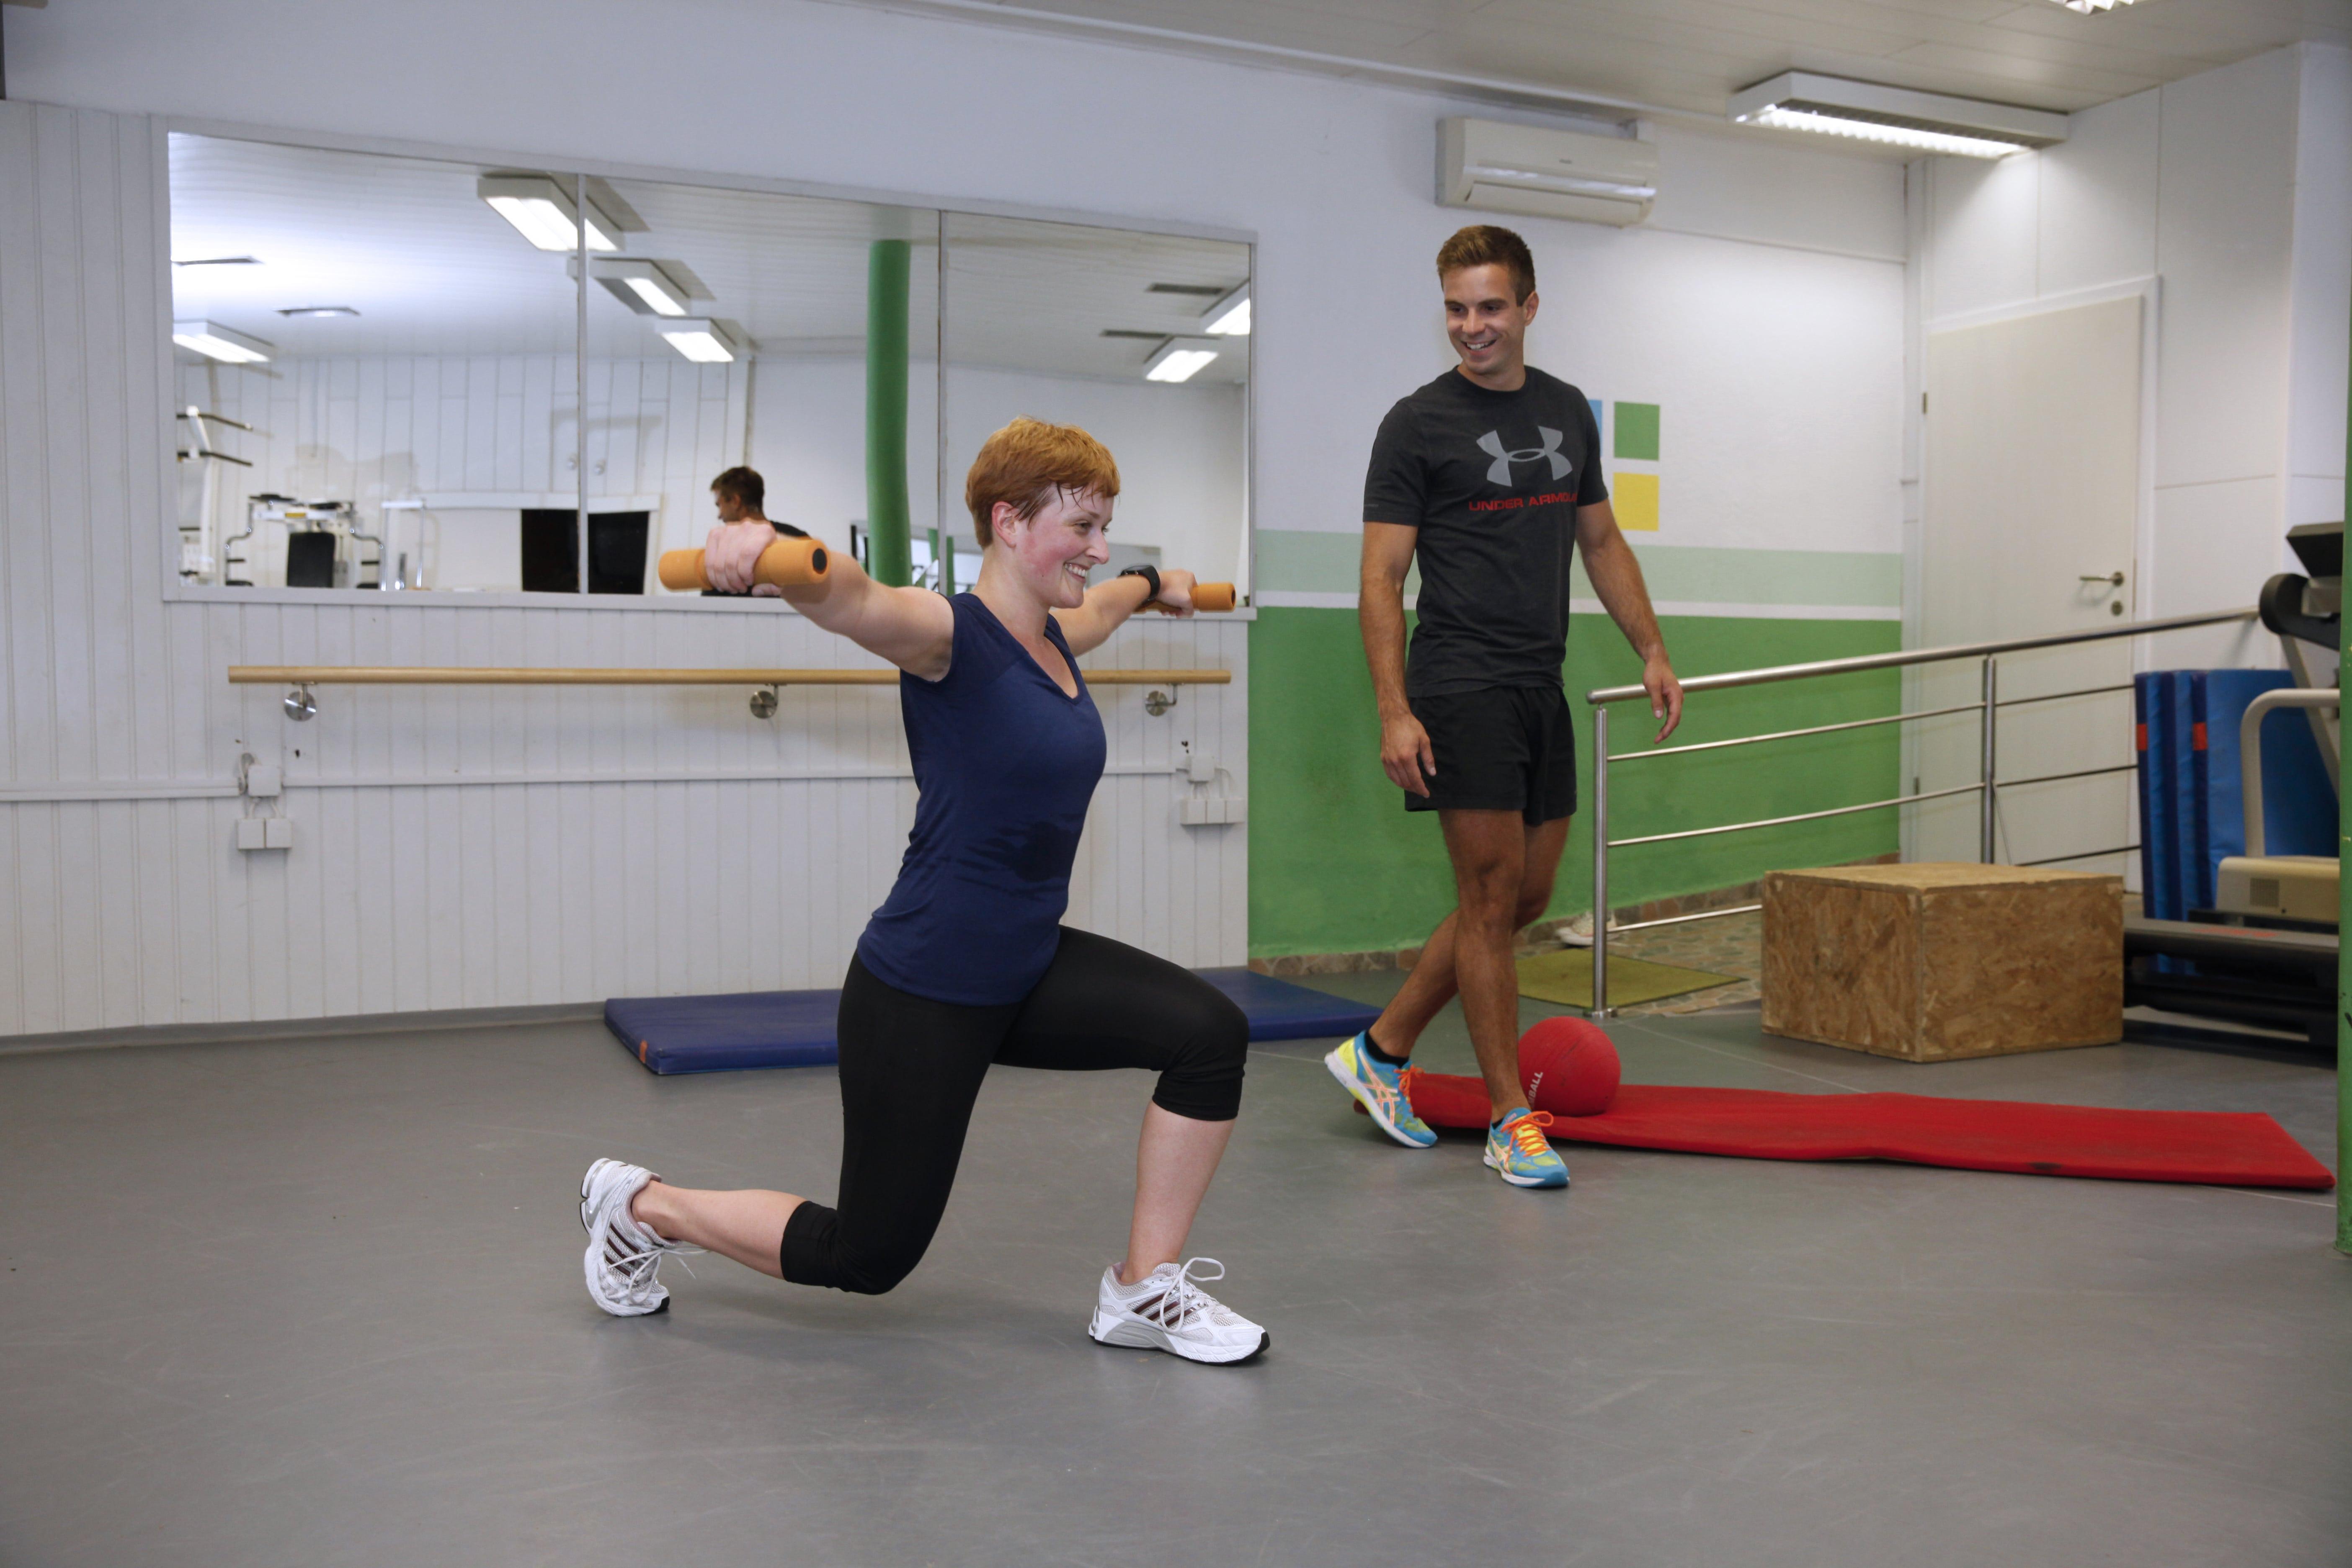 Prvi trening in kineziološka analiza